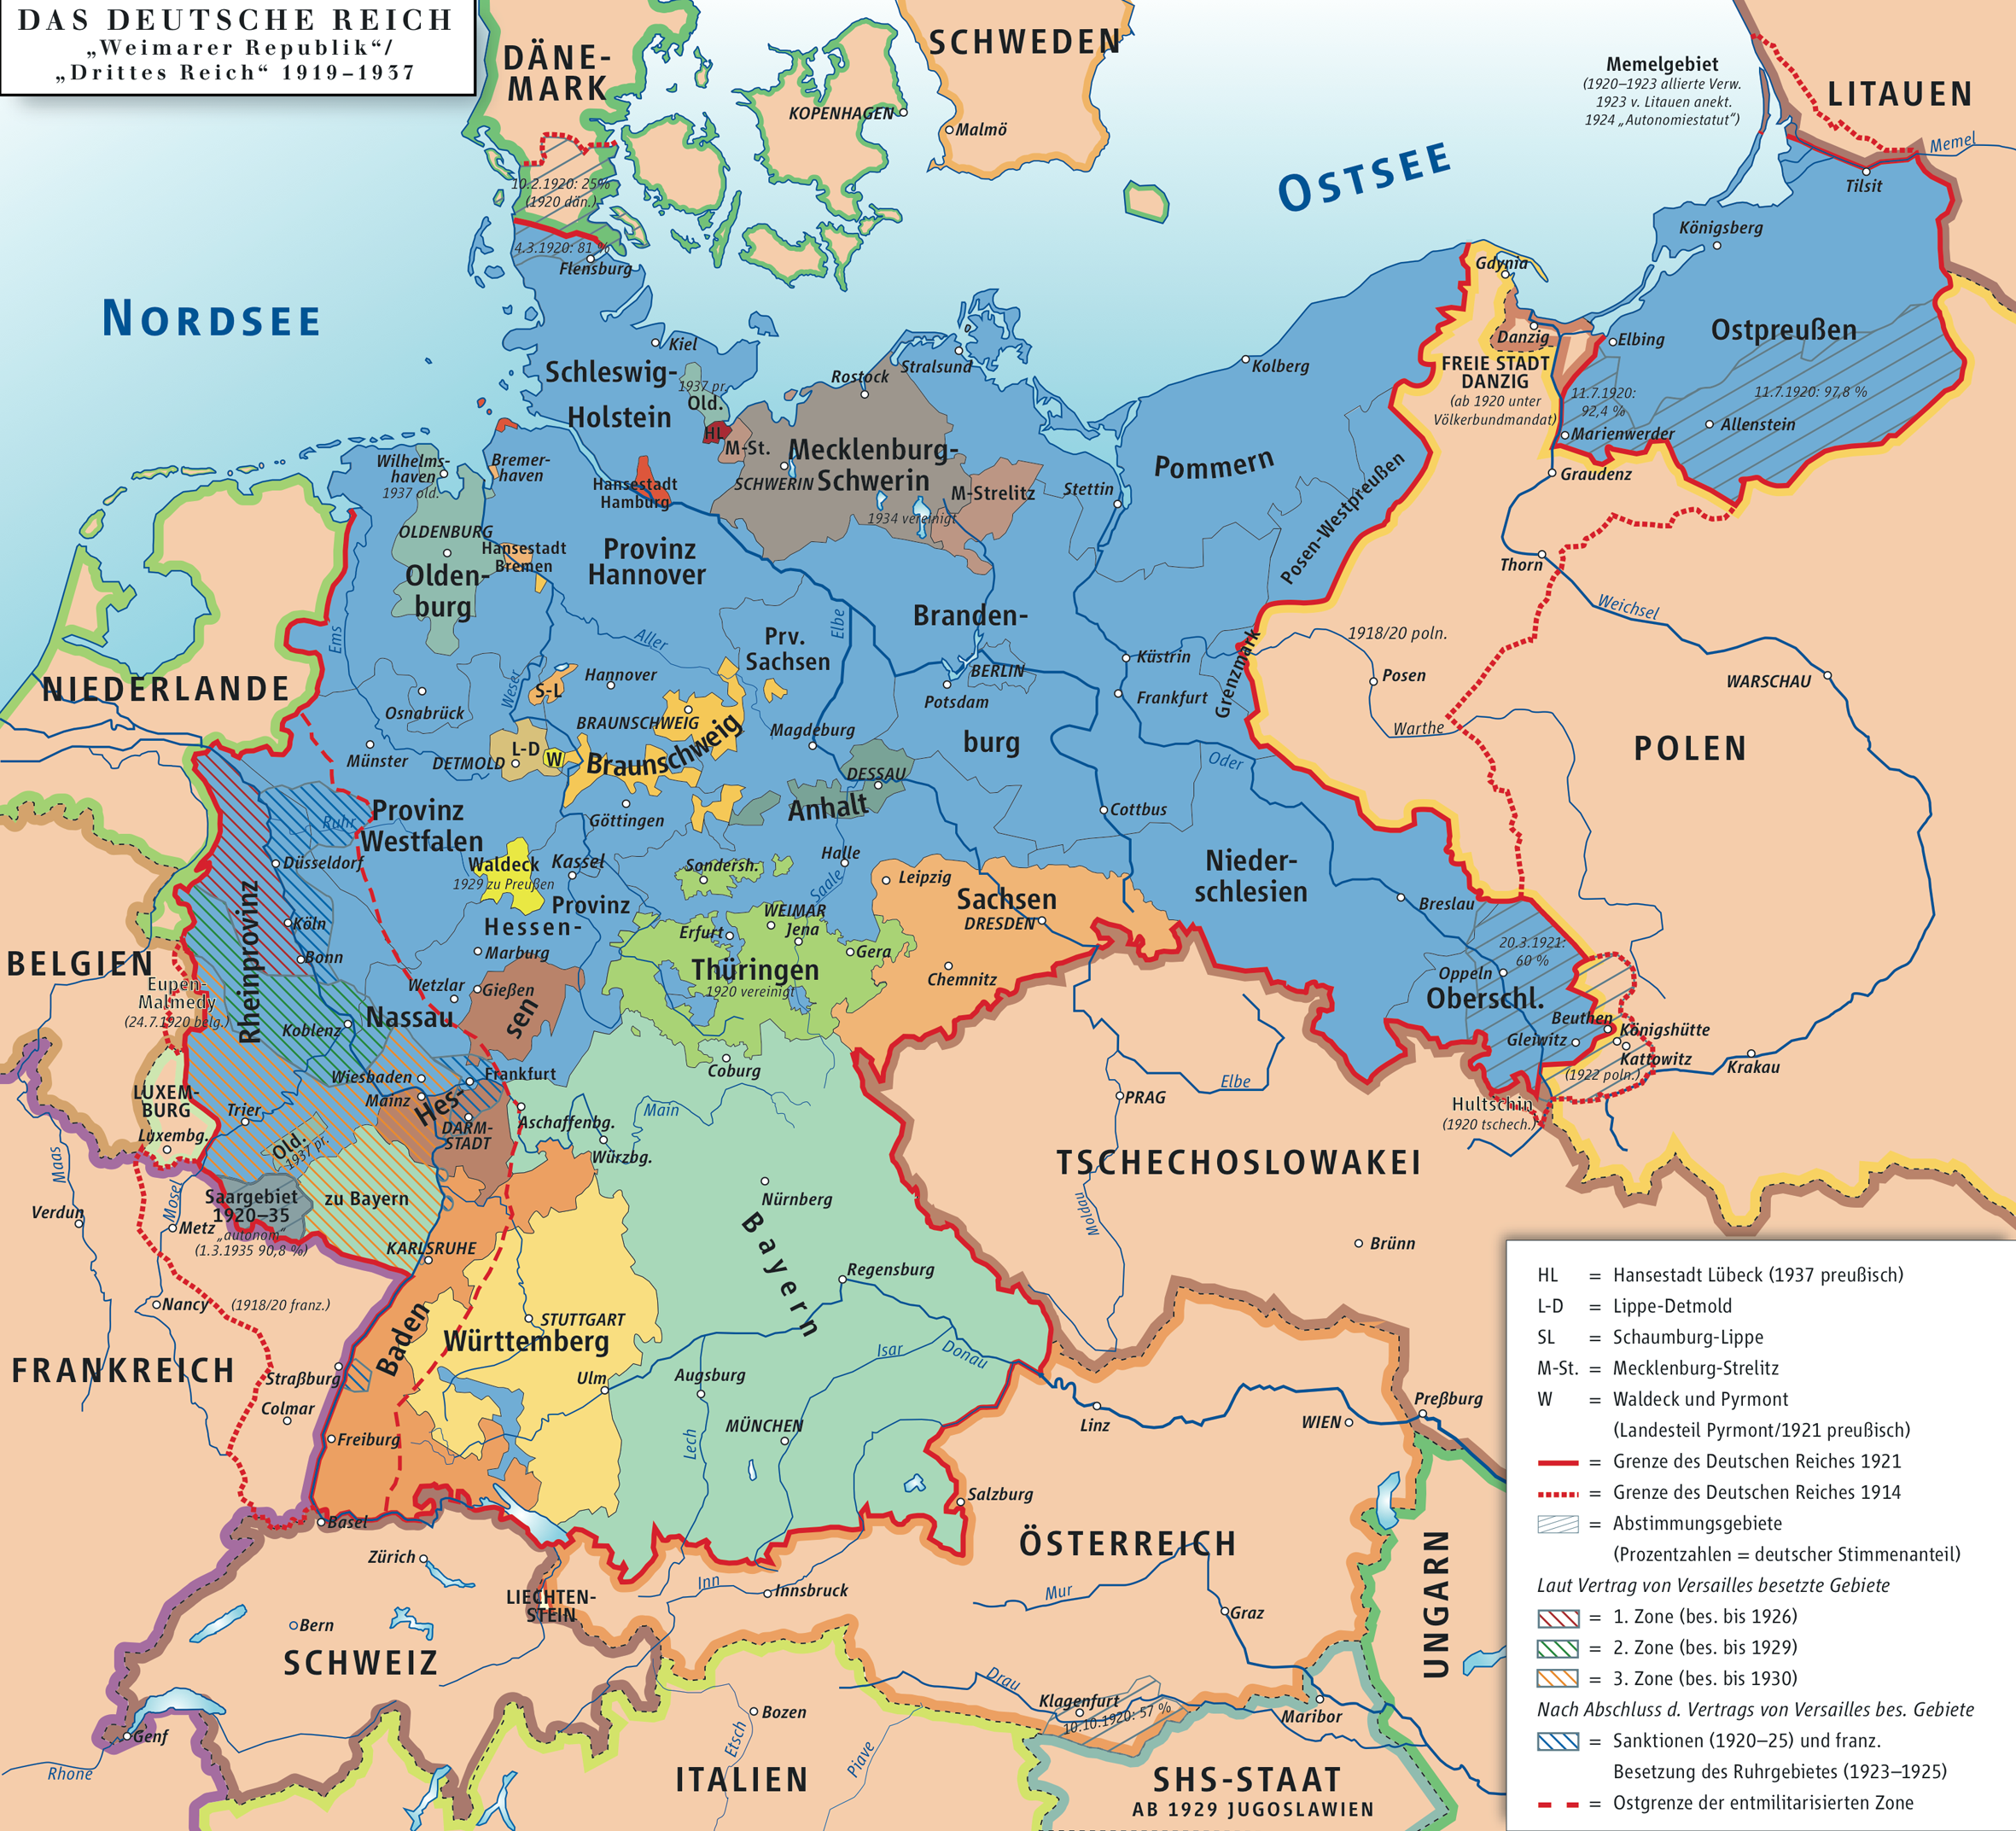 Map of the german reich republic of weimarthird reich 1919 1937 map of the german reich republic of weimarthird reich 1919 1937 altavistaventures Images